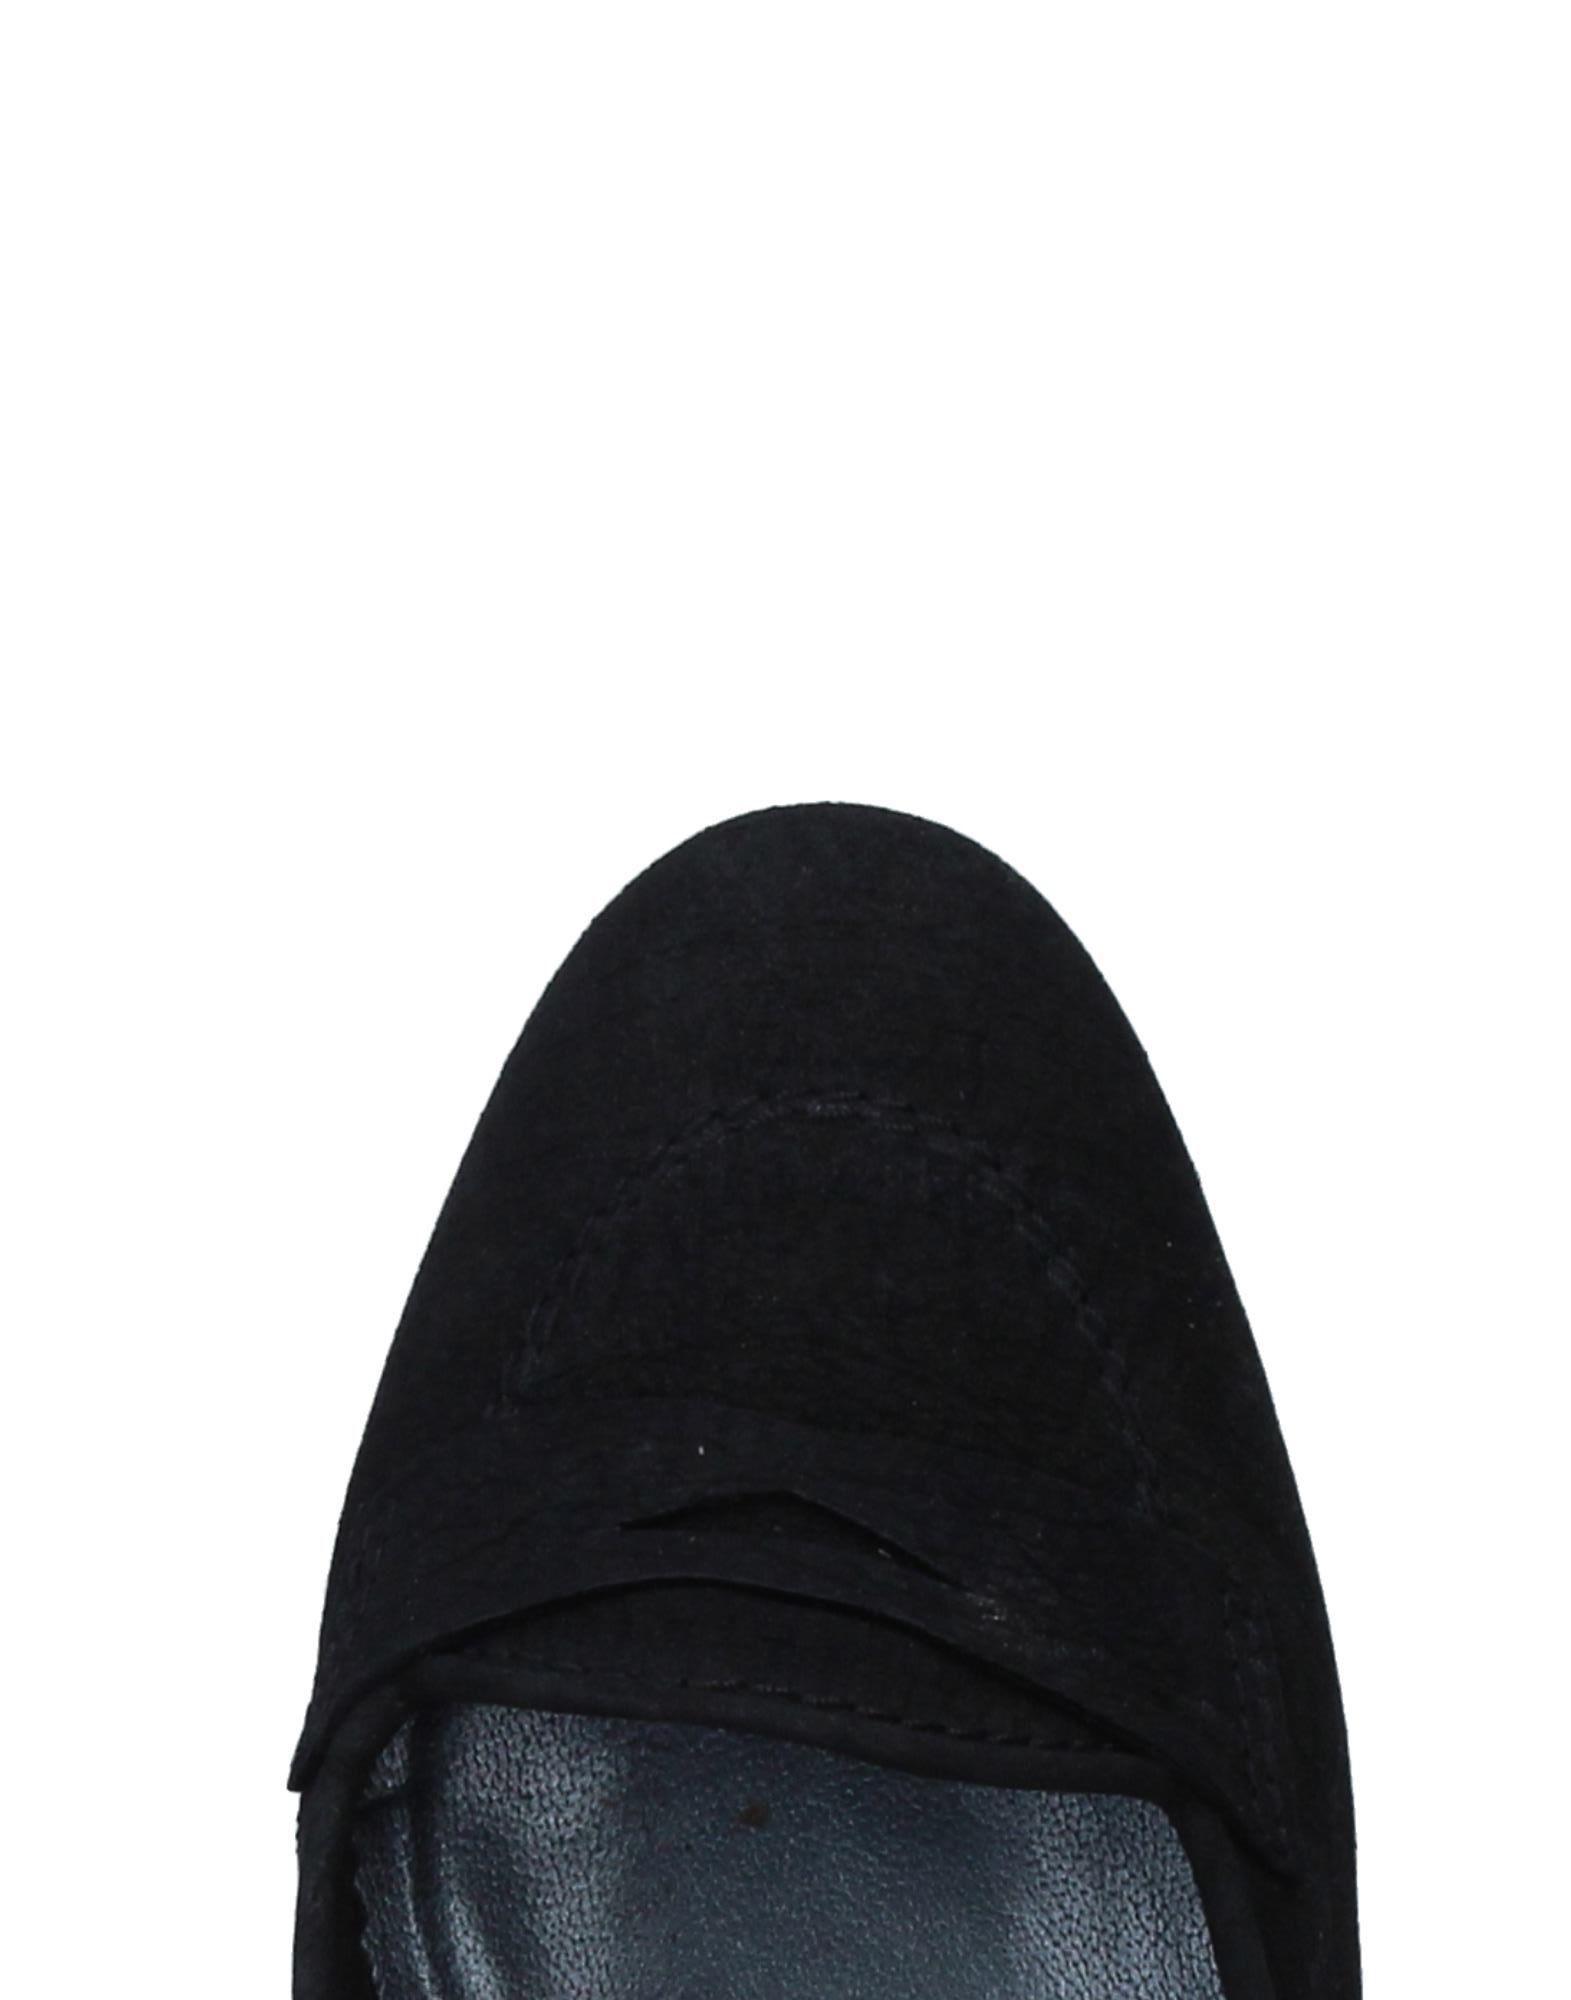 Stilvolle billige Schuhe Damen Rodolphe Menudier Mokassins Damen Schuhe  11331140UF 0aa292